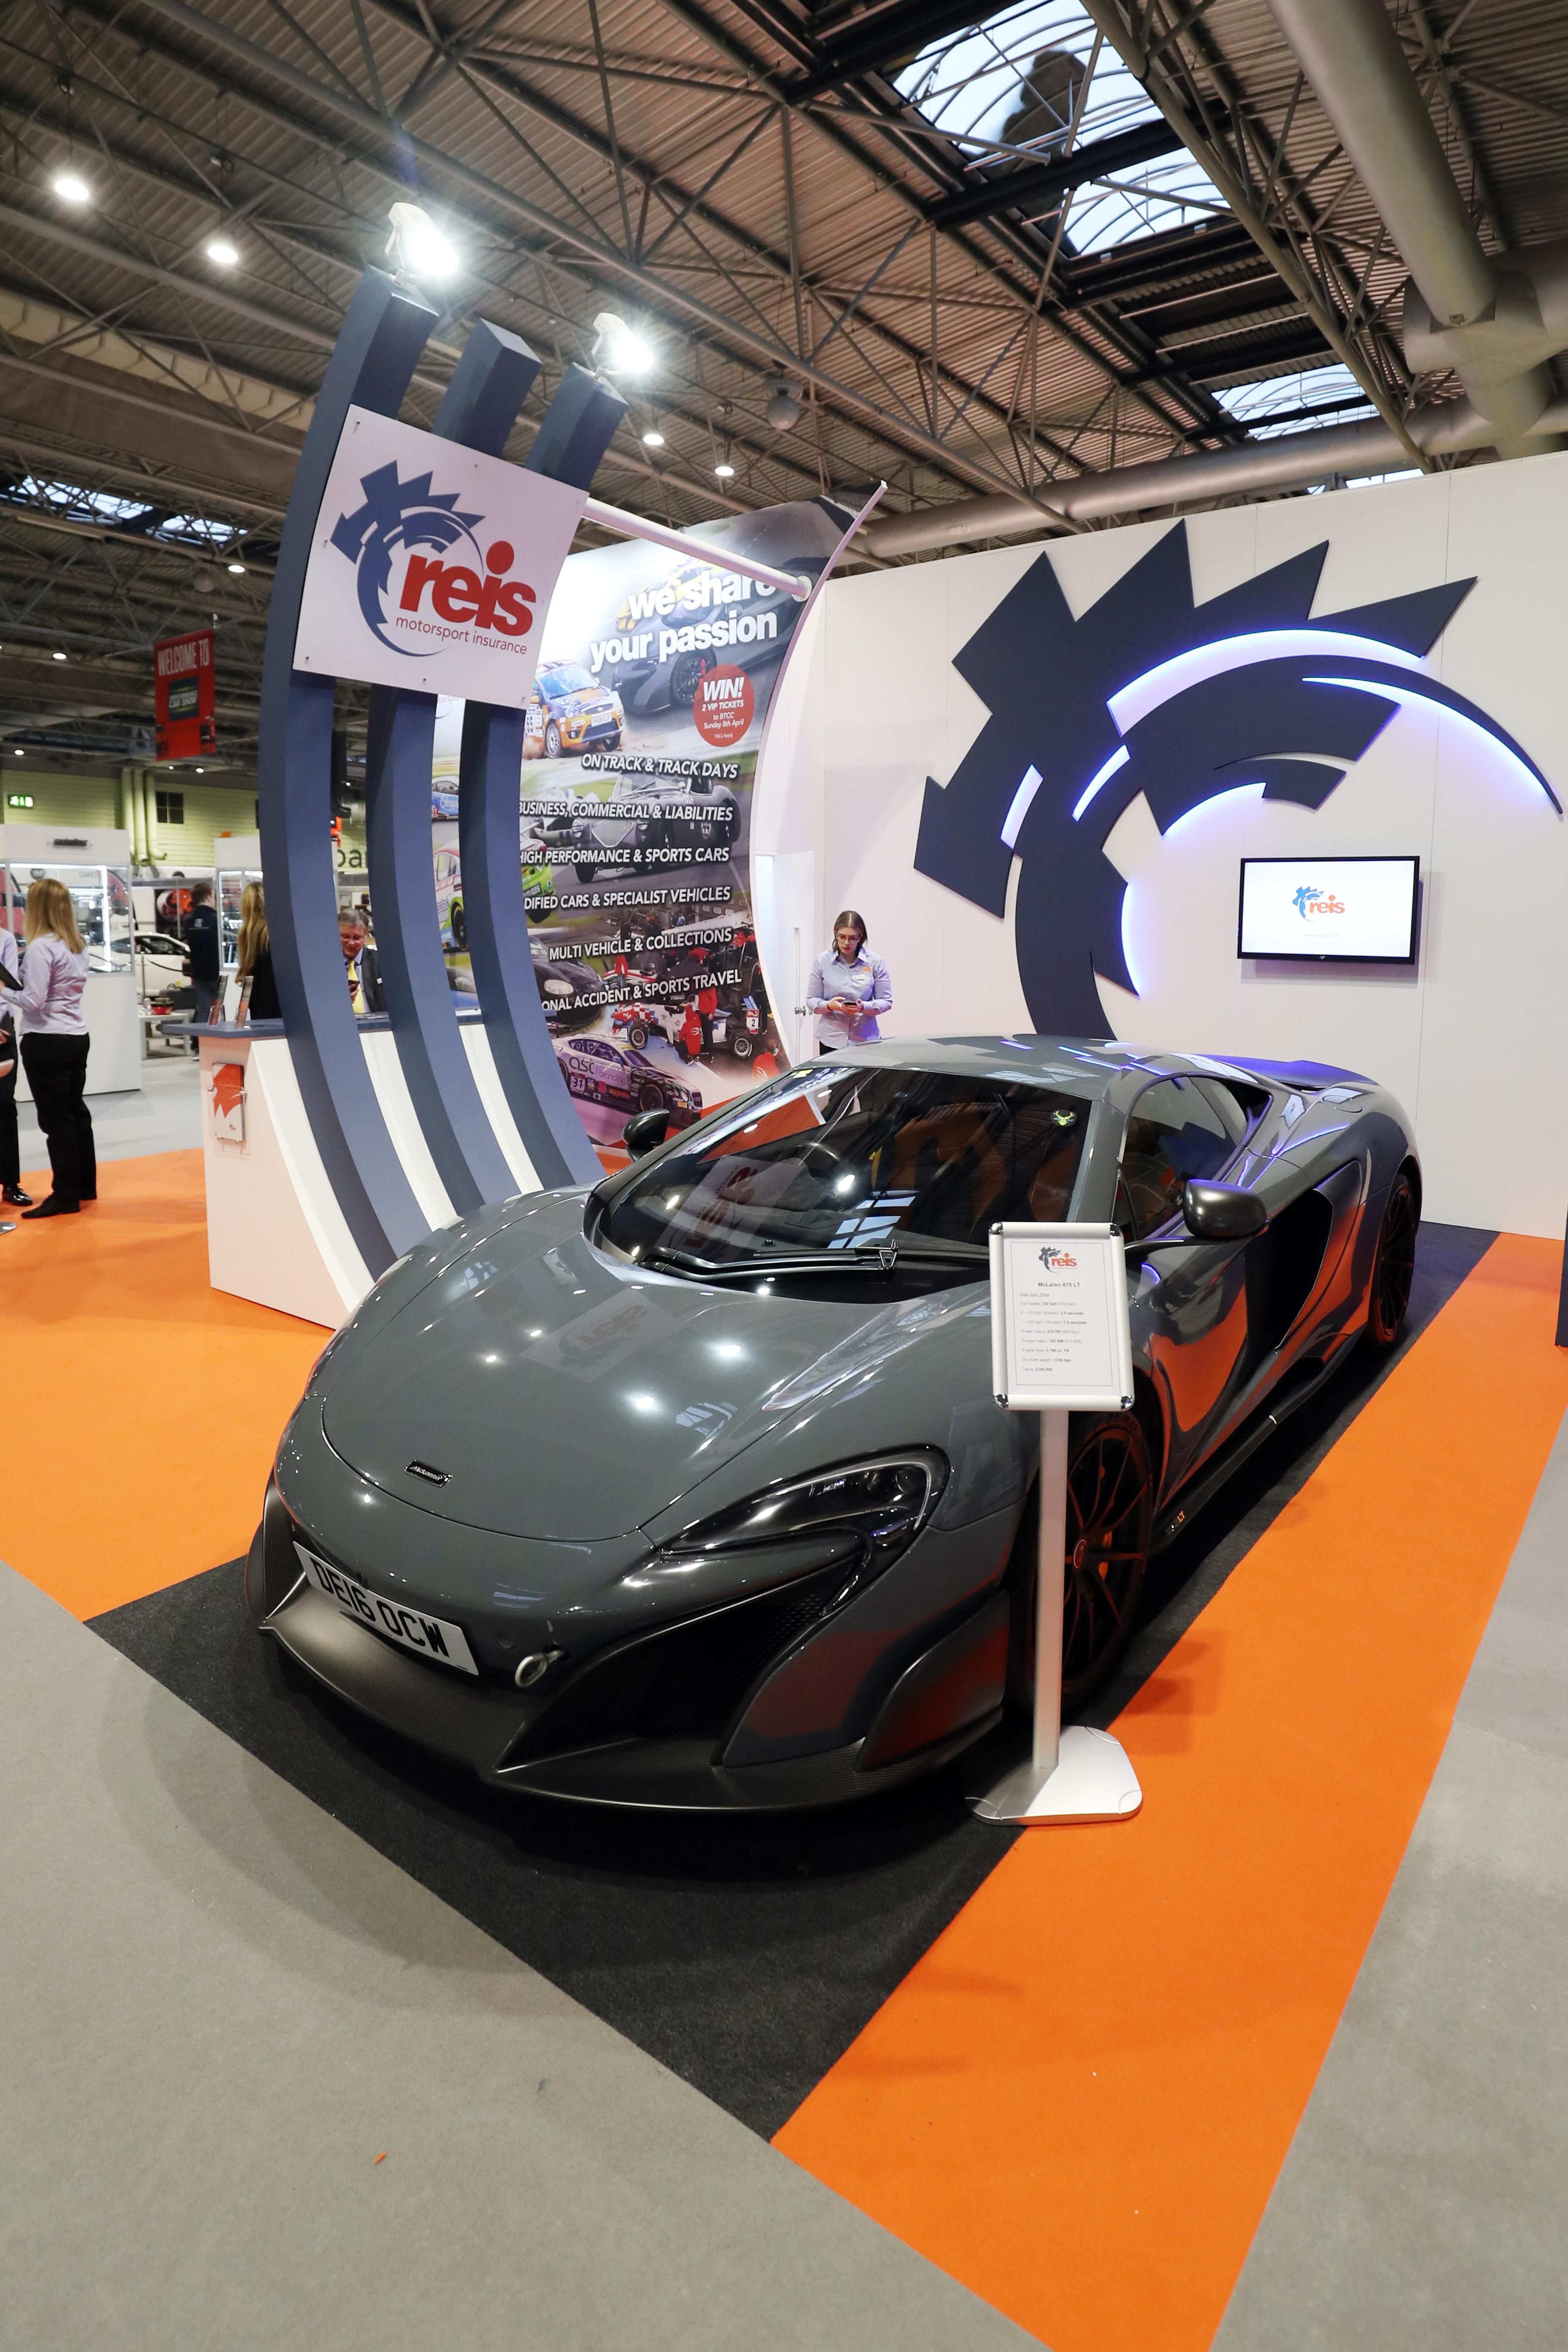 Custom built exhibition stand for Reis Insurance at Autosport 2018 NEC Birmingham, UK